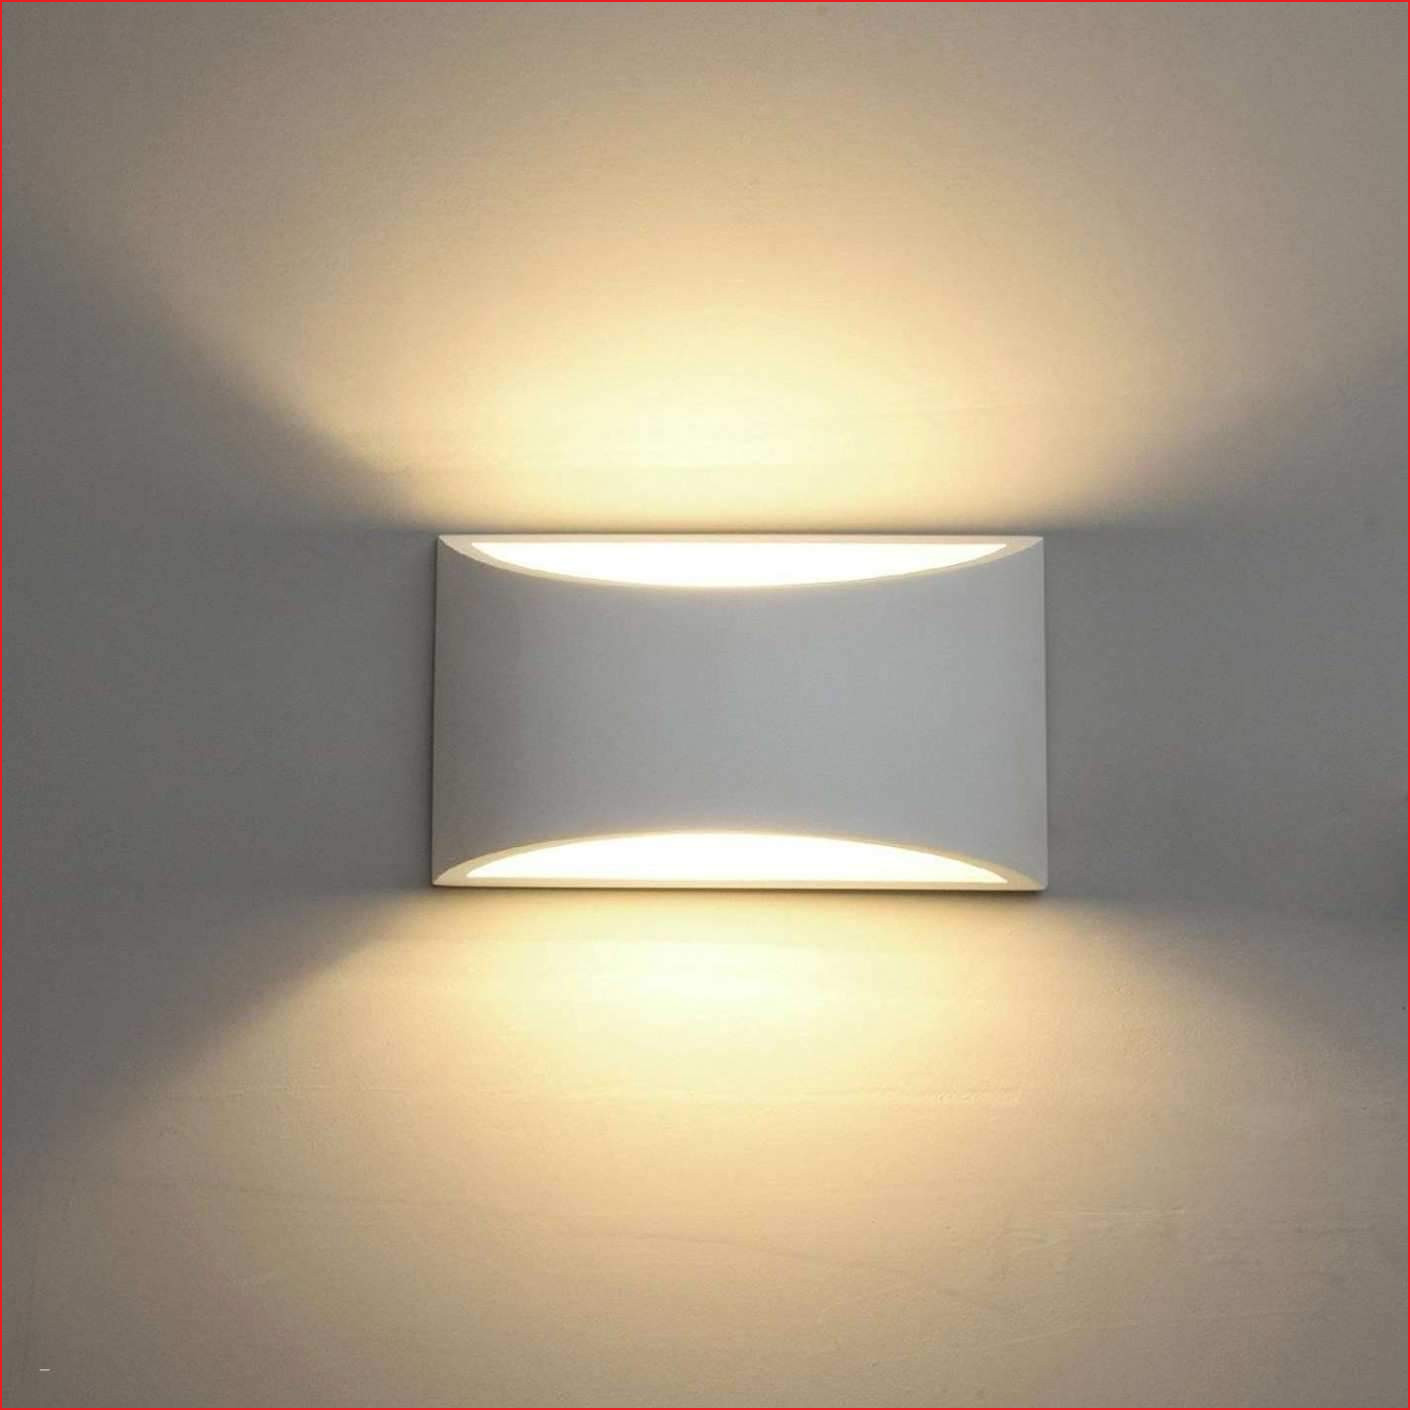 Full Size of Lampe Xxl 1416106 Xxl Wohnzimmer Lampe Wohnzimmer Wohnzimmer Lampen